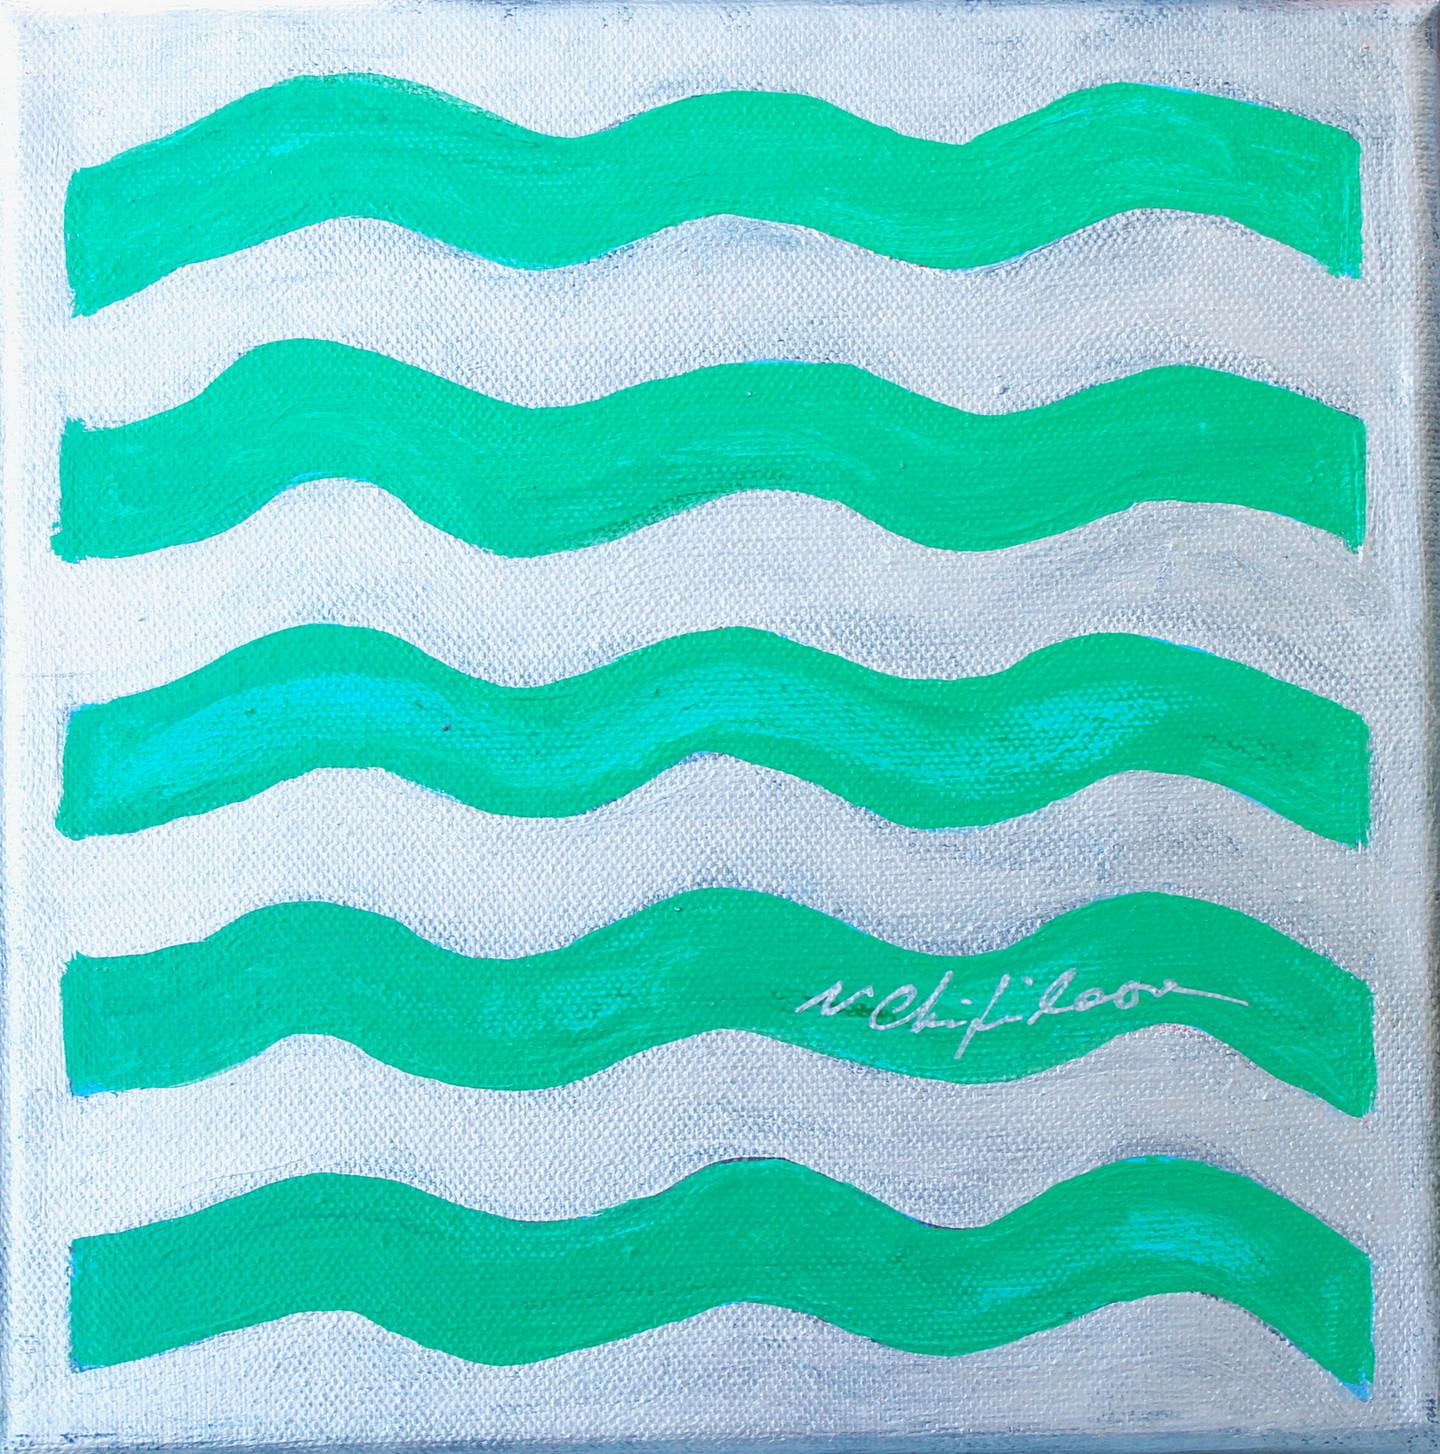 Nath Chipilova (Atelier NN art store) - Element Eau 3